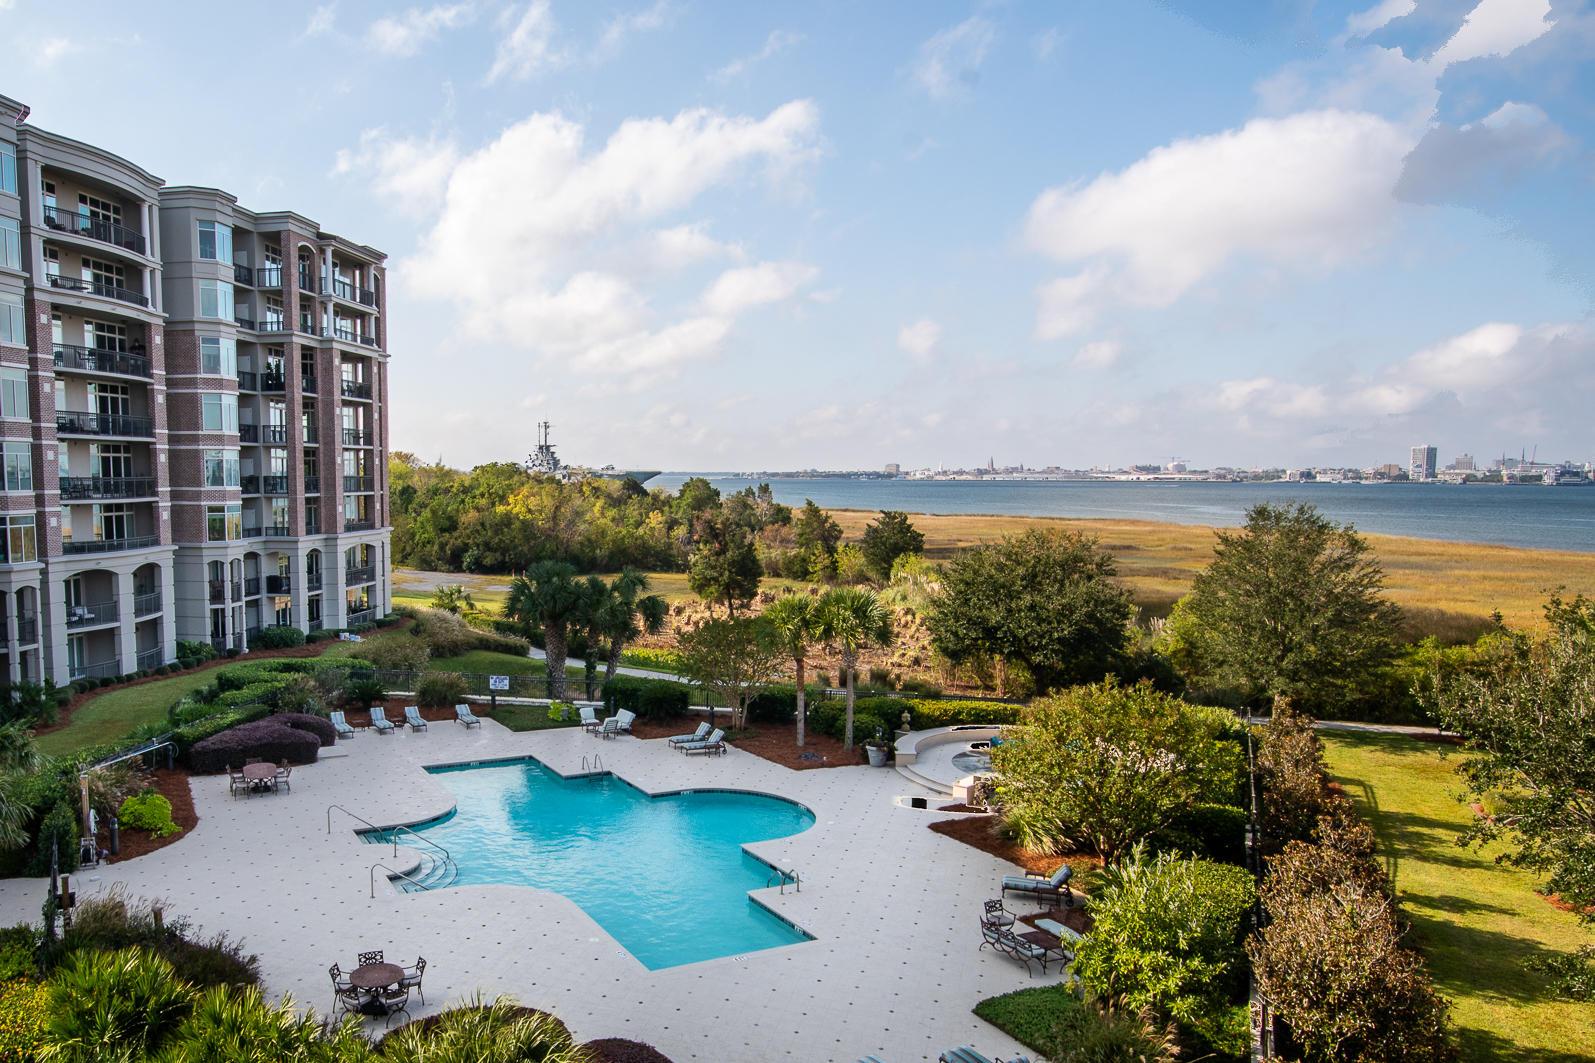 Renaissance On Chas Harbor Homes For Sale - 144 Plaza, Mount Pleasant, SC - 3